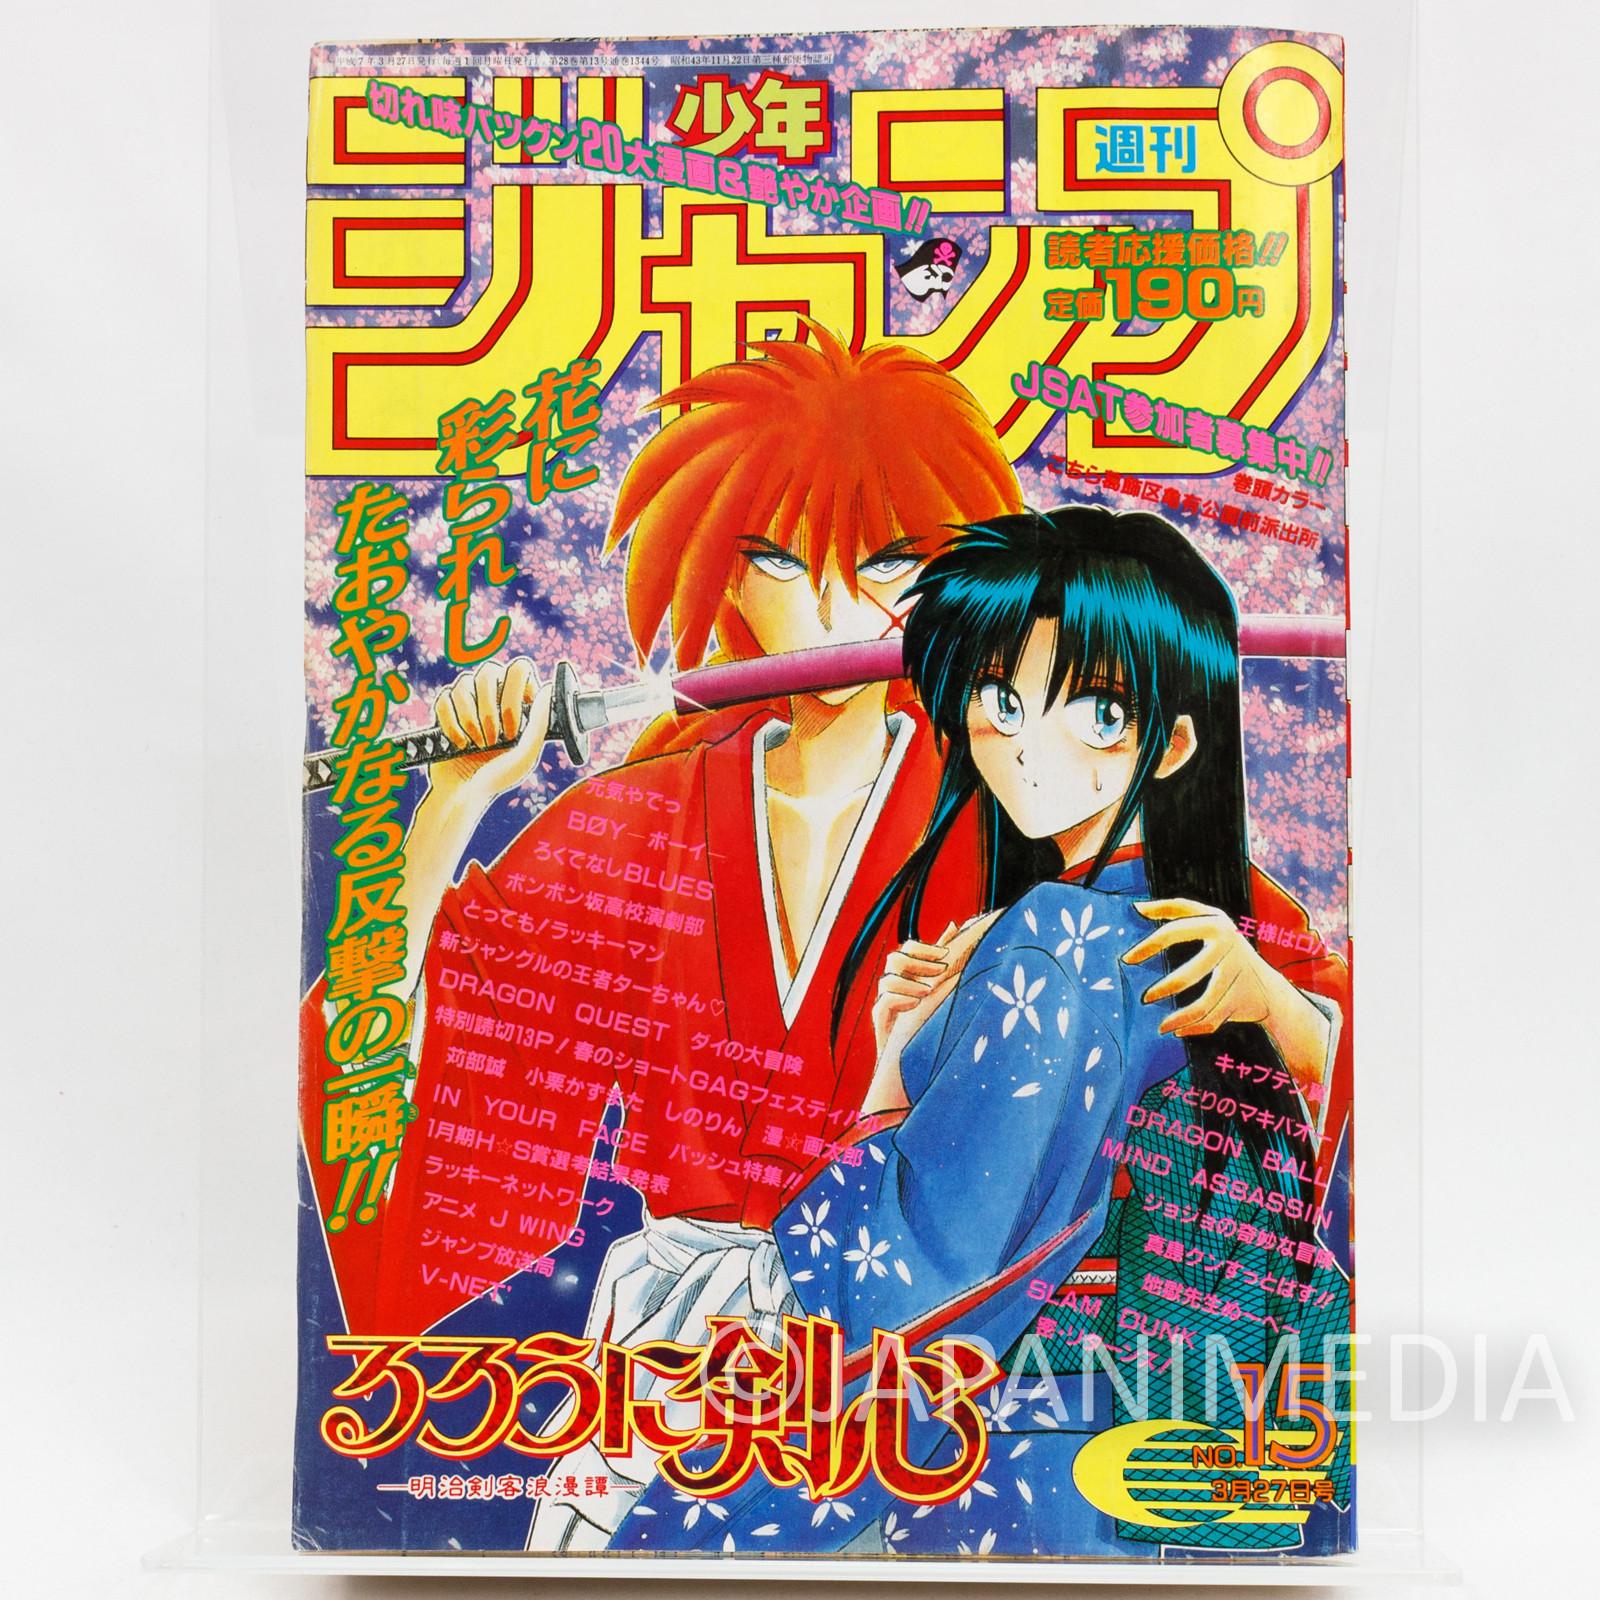 RARE!! Weekly Shonen JUMP Vol.15 1995 Rurouni Kenshin / Japanese Magazine